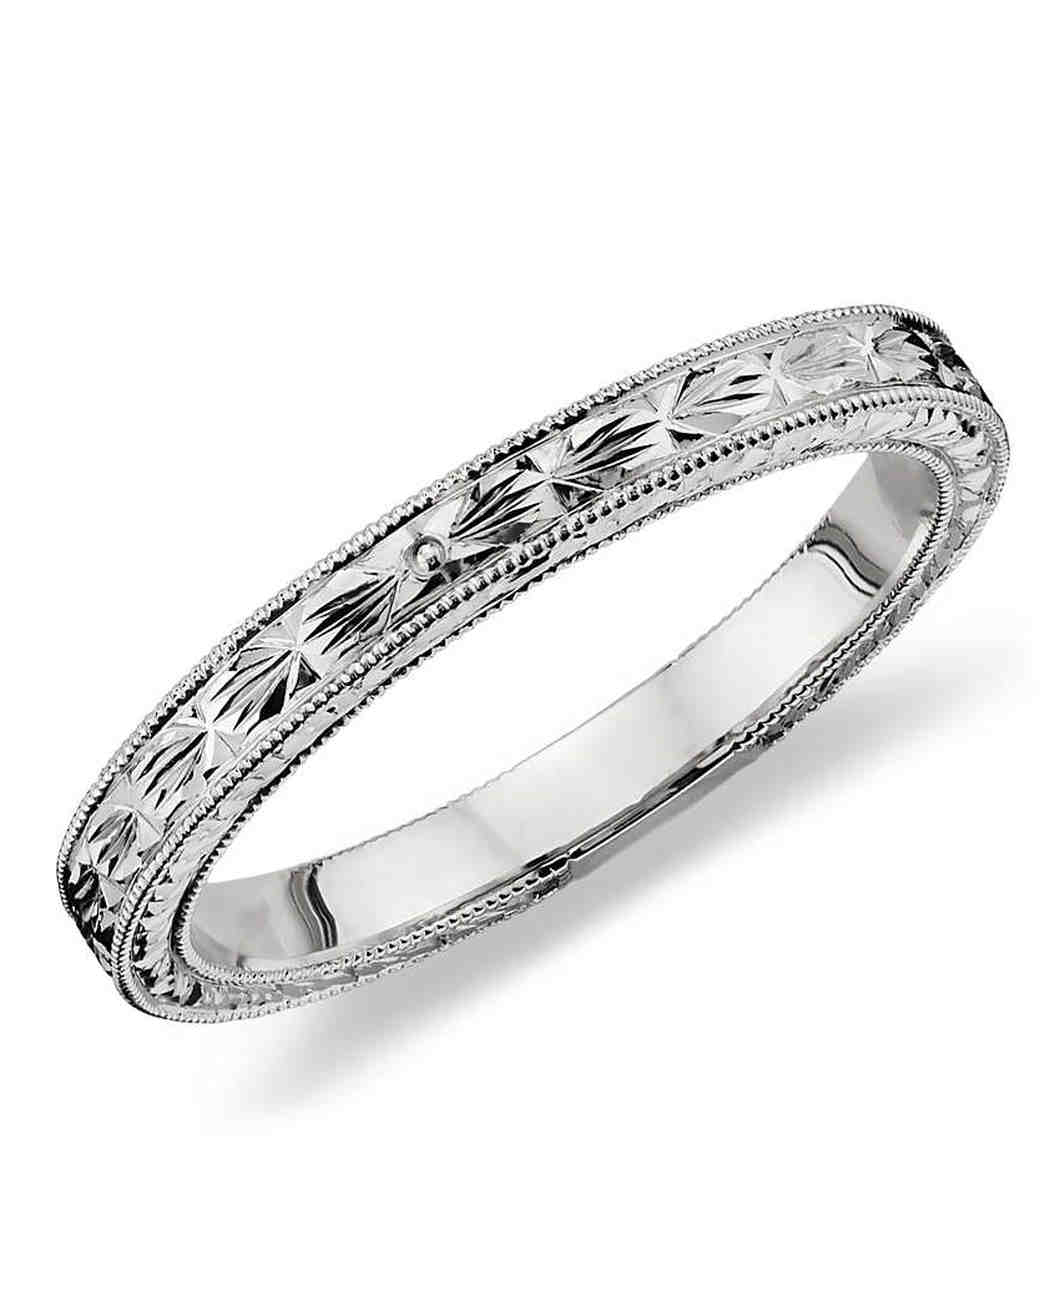 gold-wedding-bands-blue-nile-ring-0415.jpg